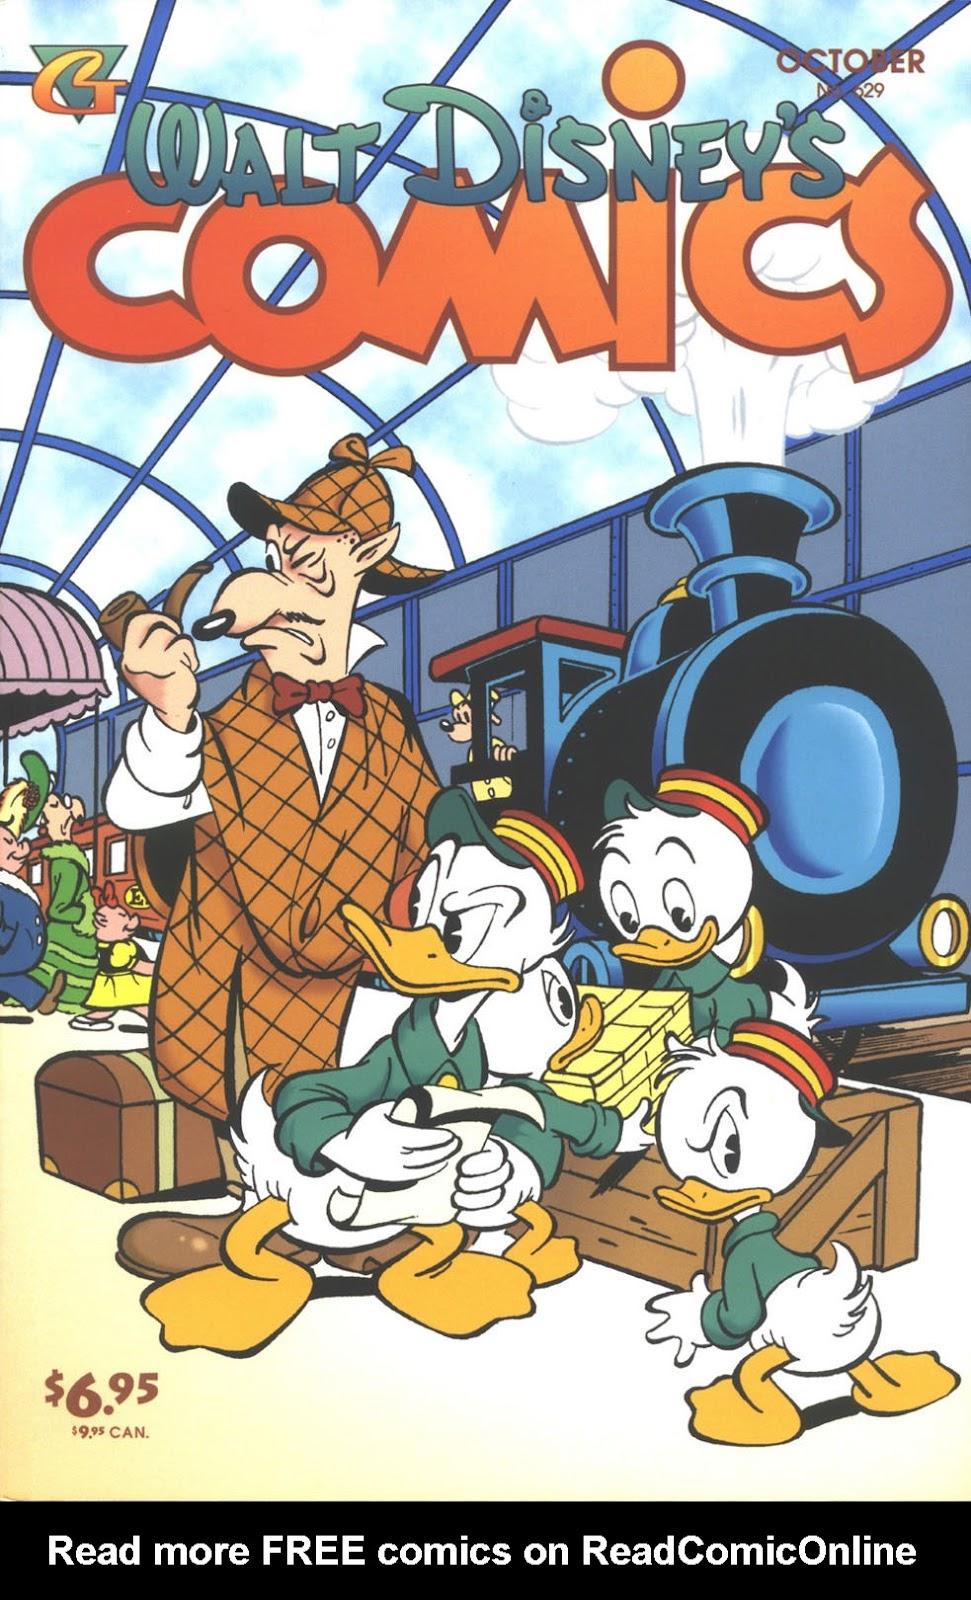 Walt Disneys Comics and Stories 629 Page 1